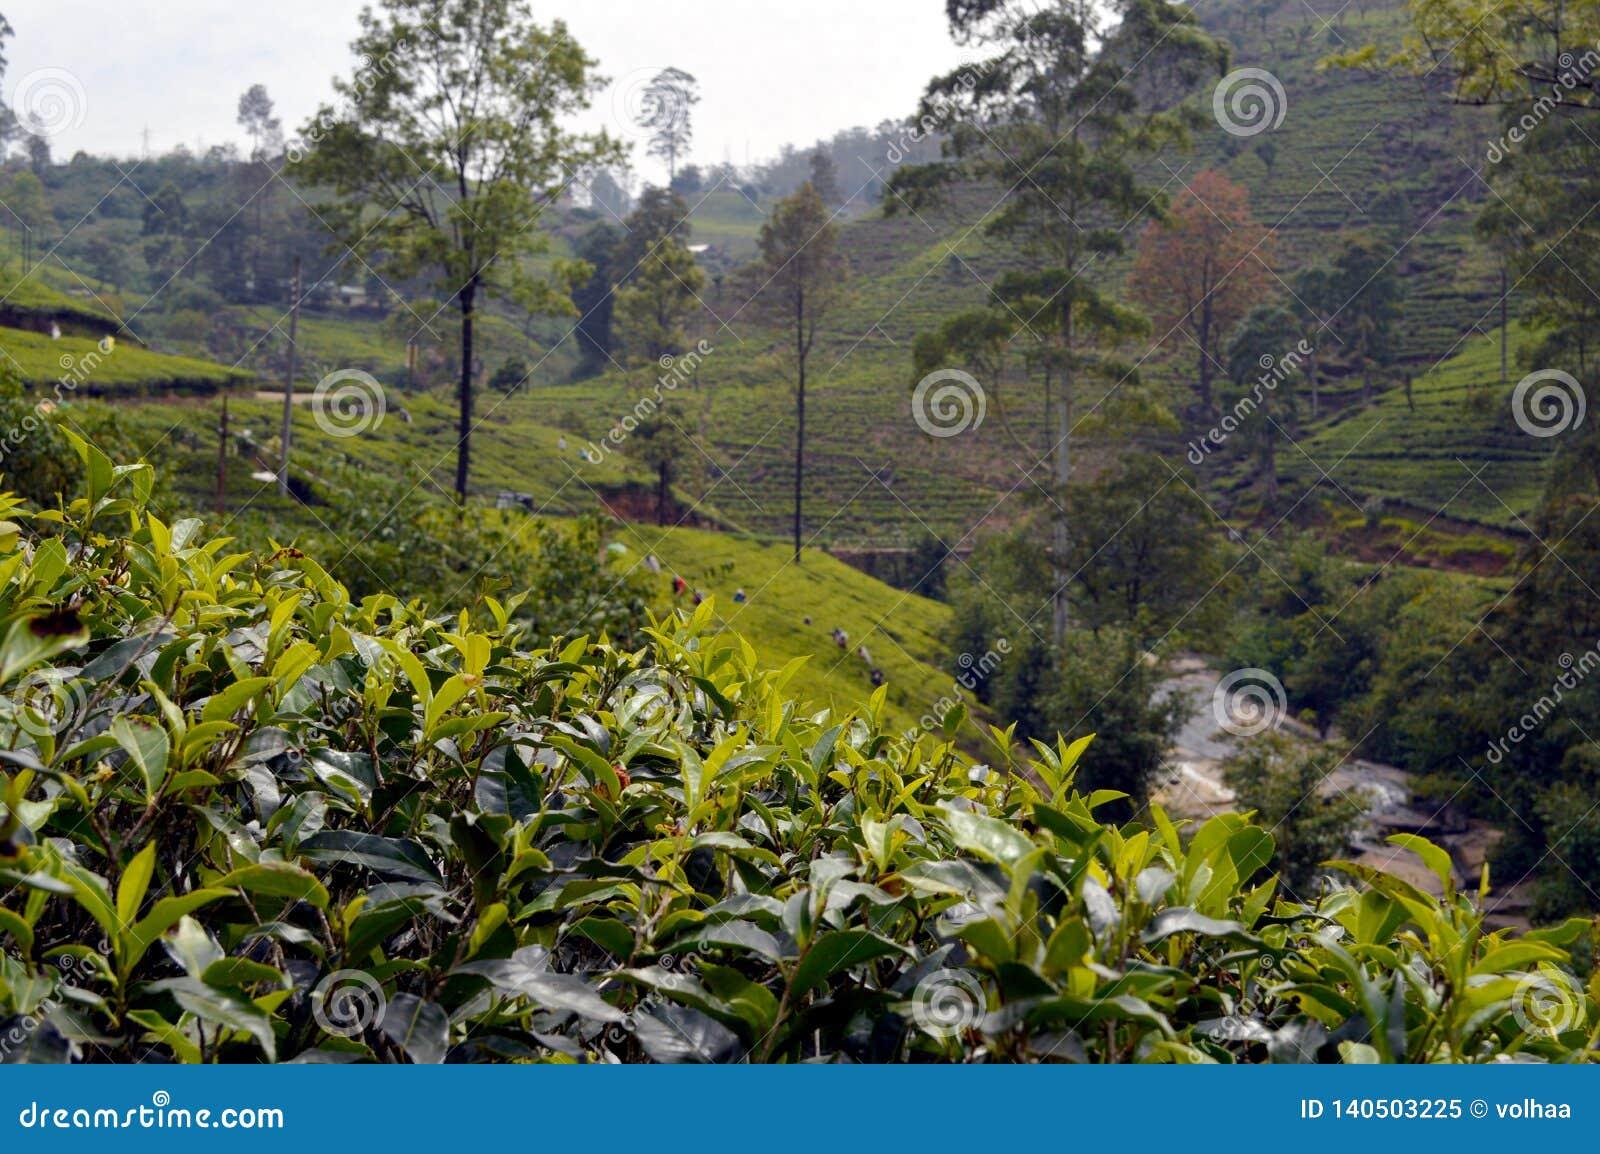 Tea plantation in Sri Lanka